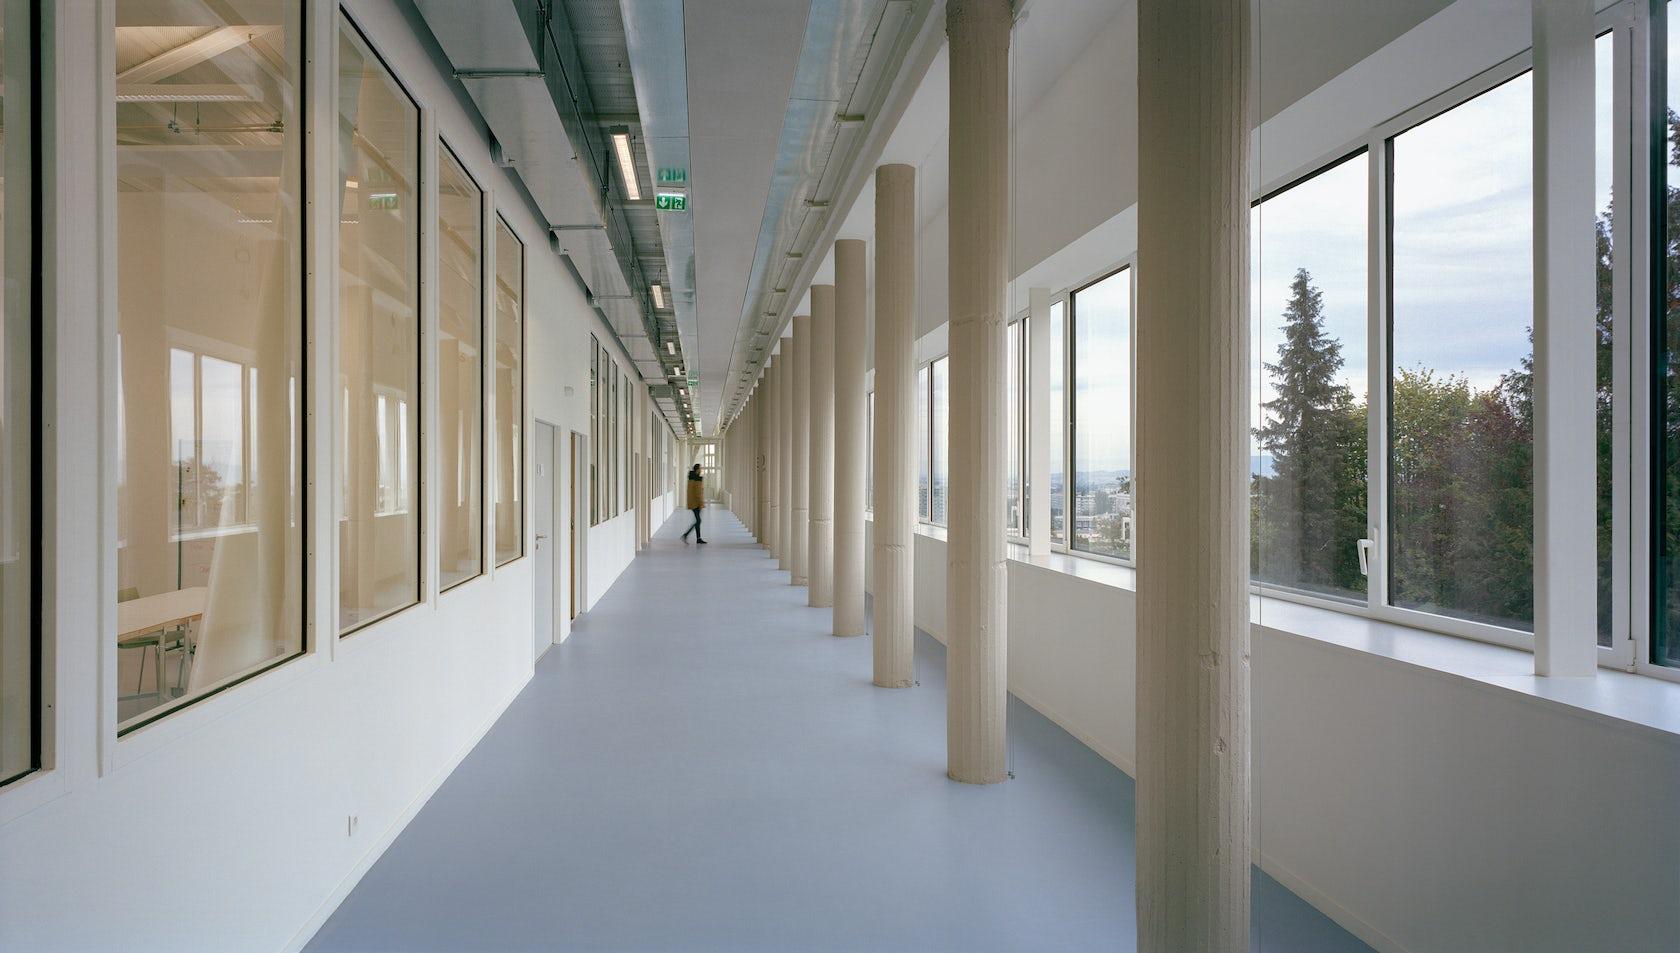 clermont ferrand school of architecture architizer. Black Bedroom Furniture Sets. Home Design Ideas